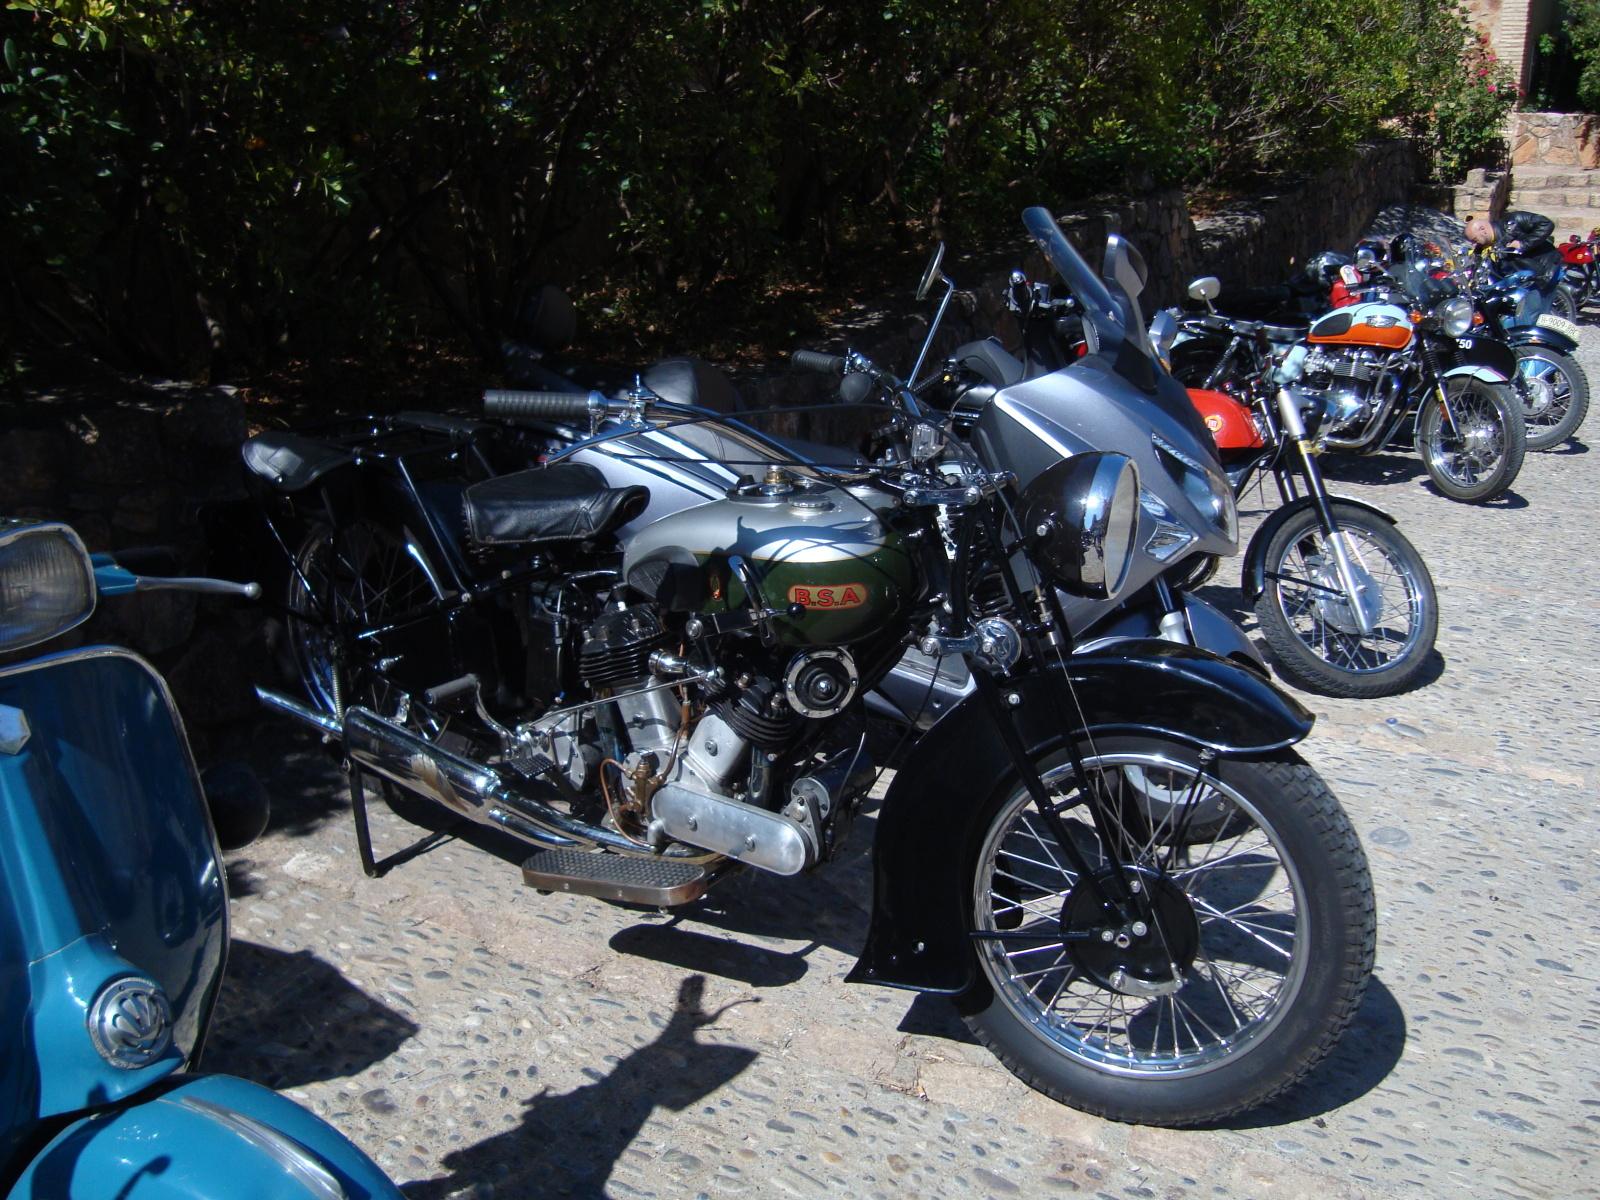 XI concentracion de motos antiguas en Alberuela de tubo (Huesca) Dnge11